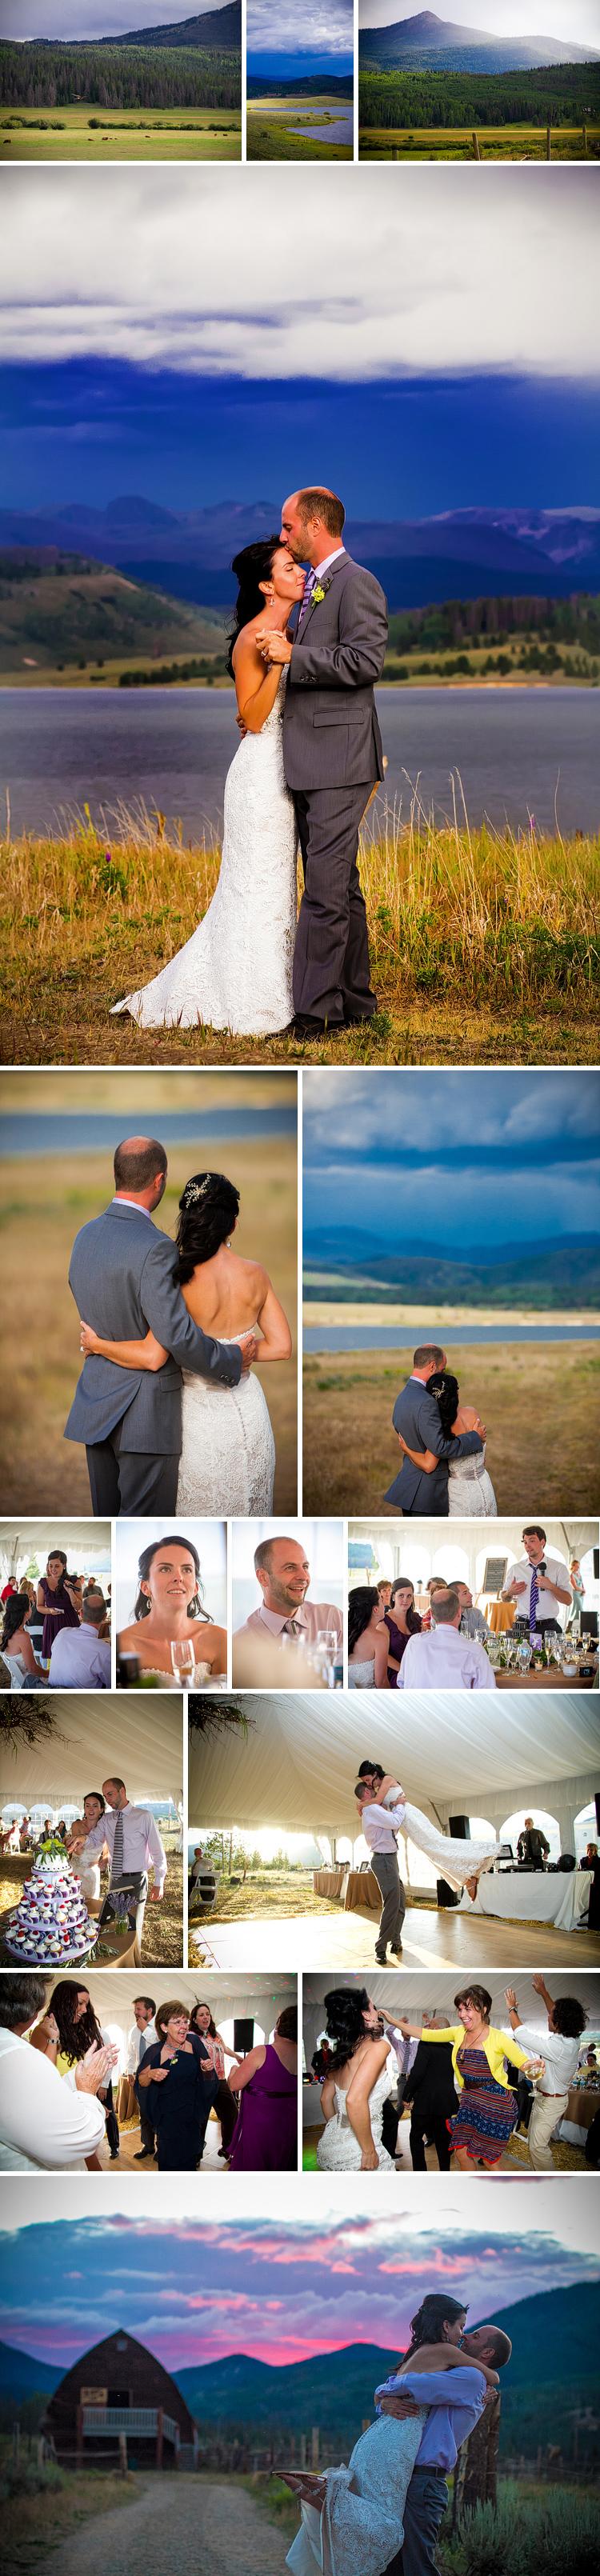 steamboat-springs-fetcher-barn-wedding04